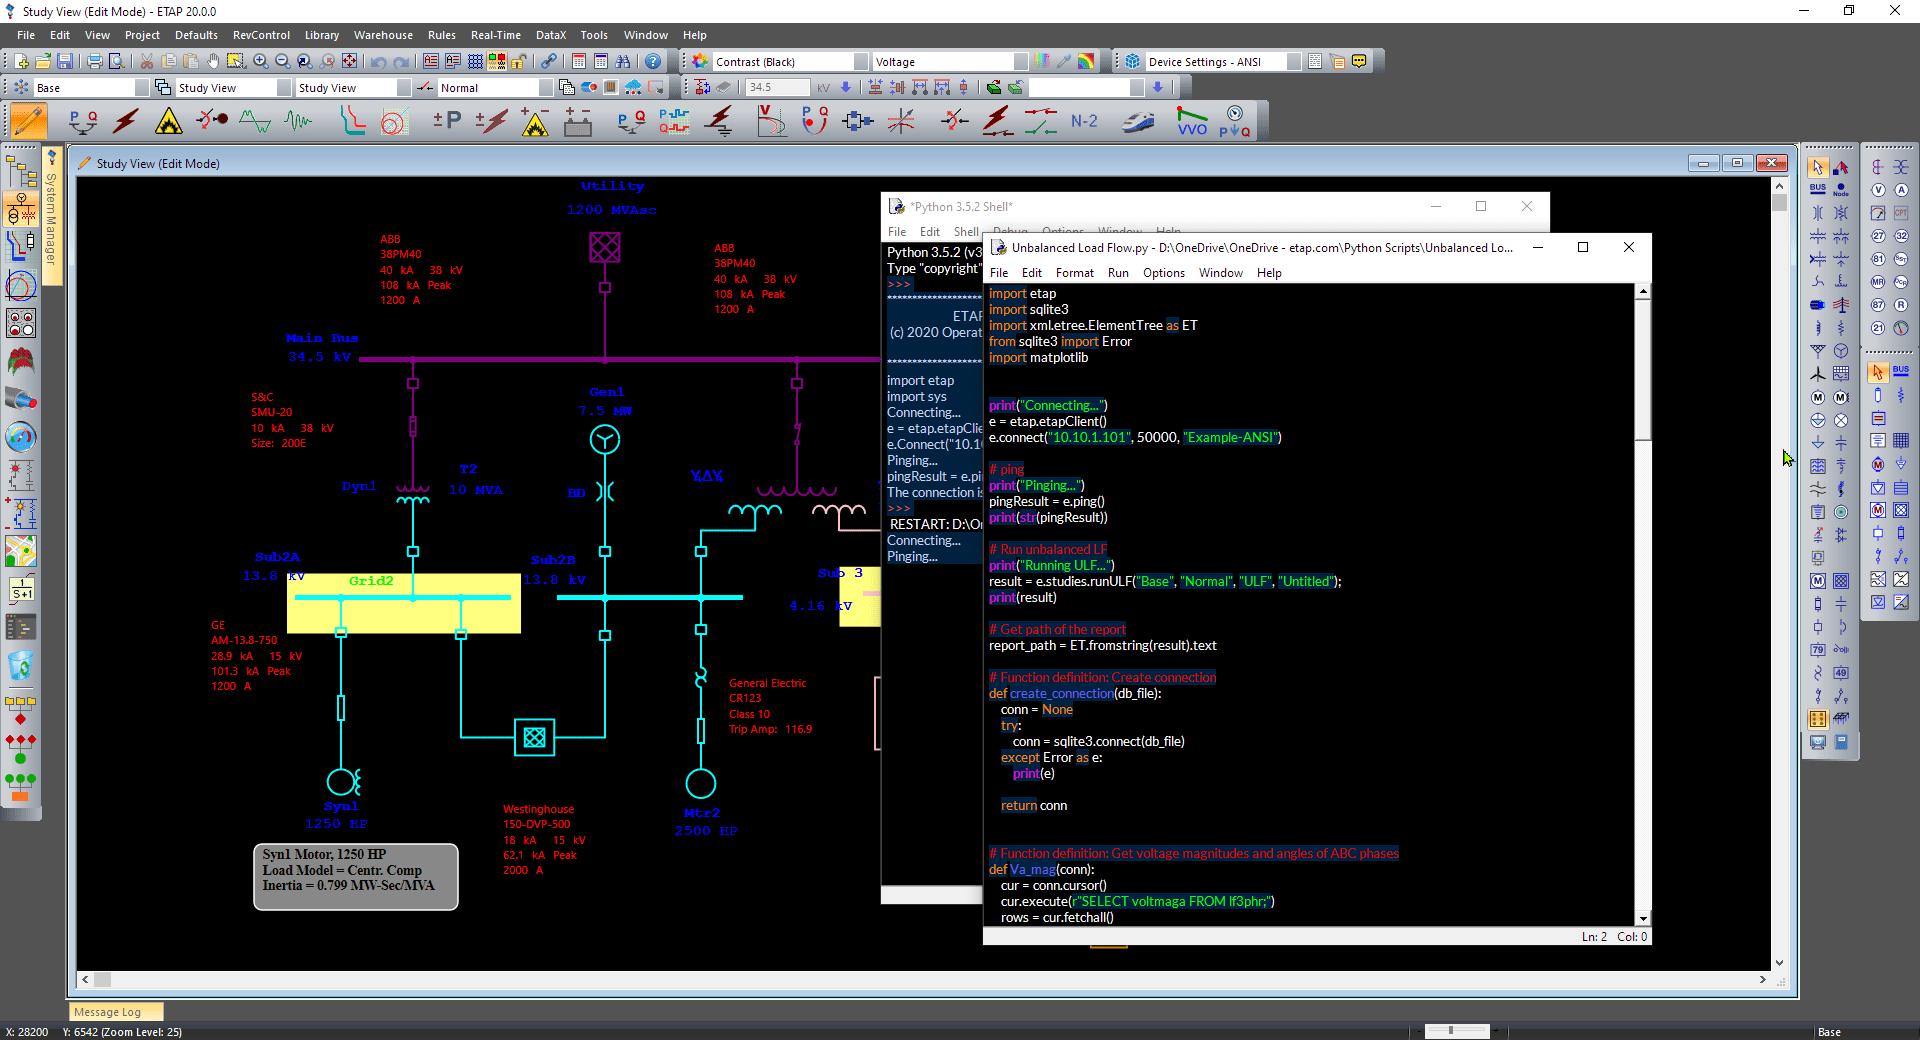 etapPy-Study-view